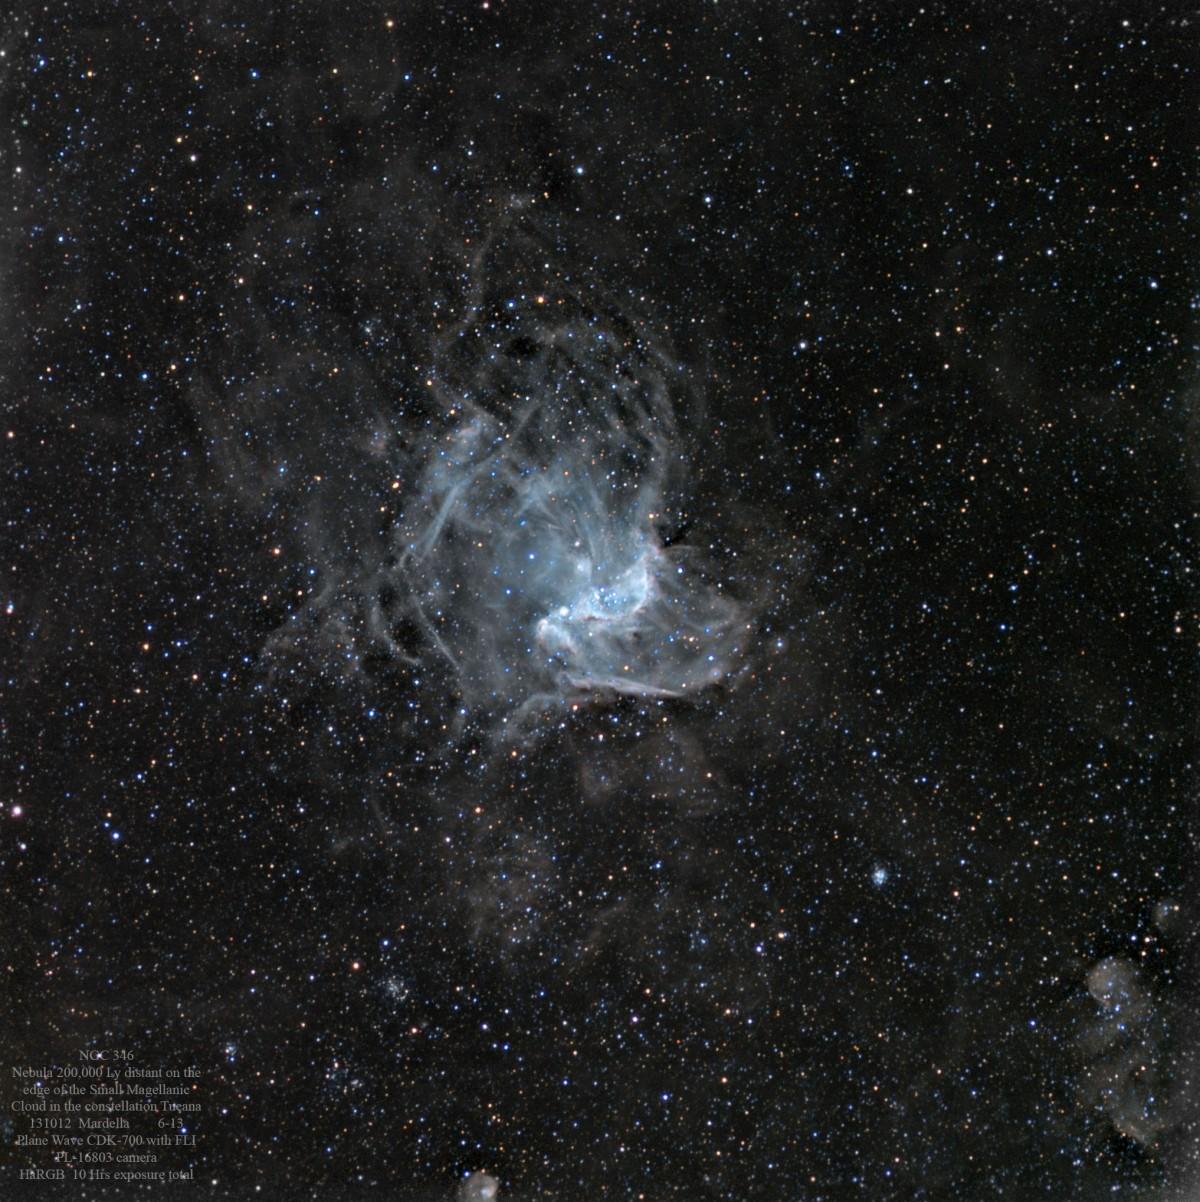 NGC 346 131012CDK HaRGB 6-13s